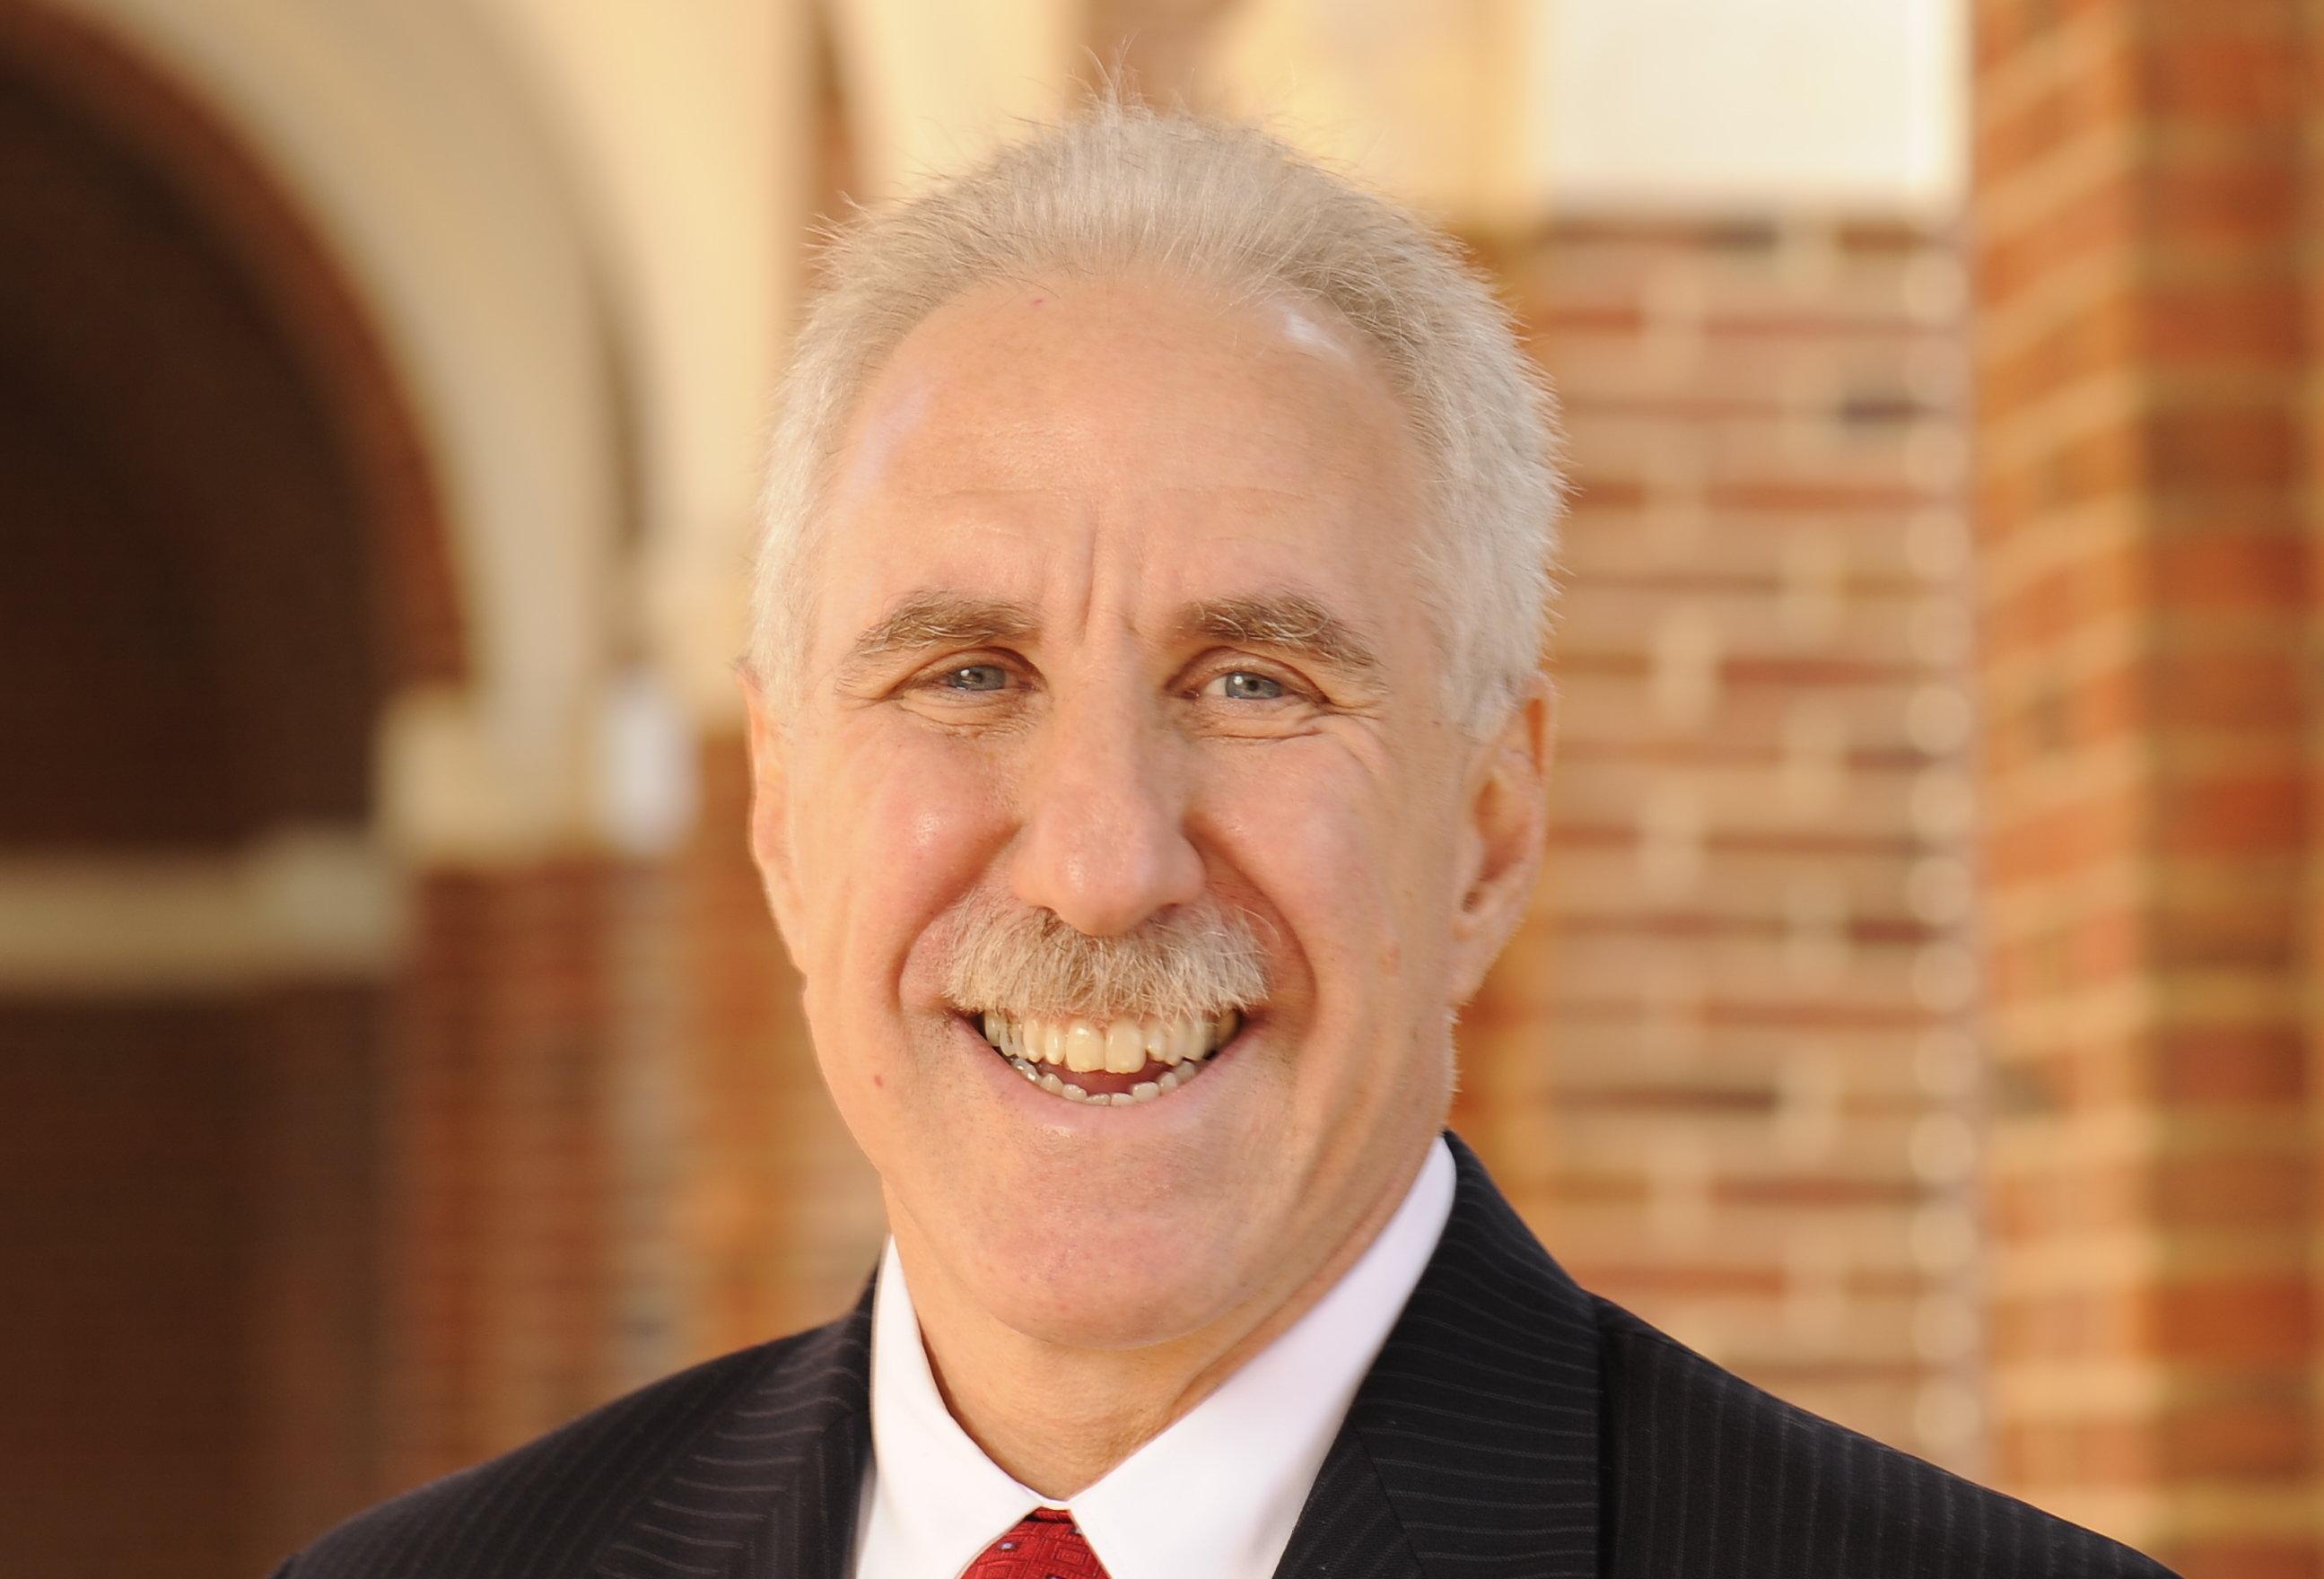 Photo of Paul B. Rothman, M.D.